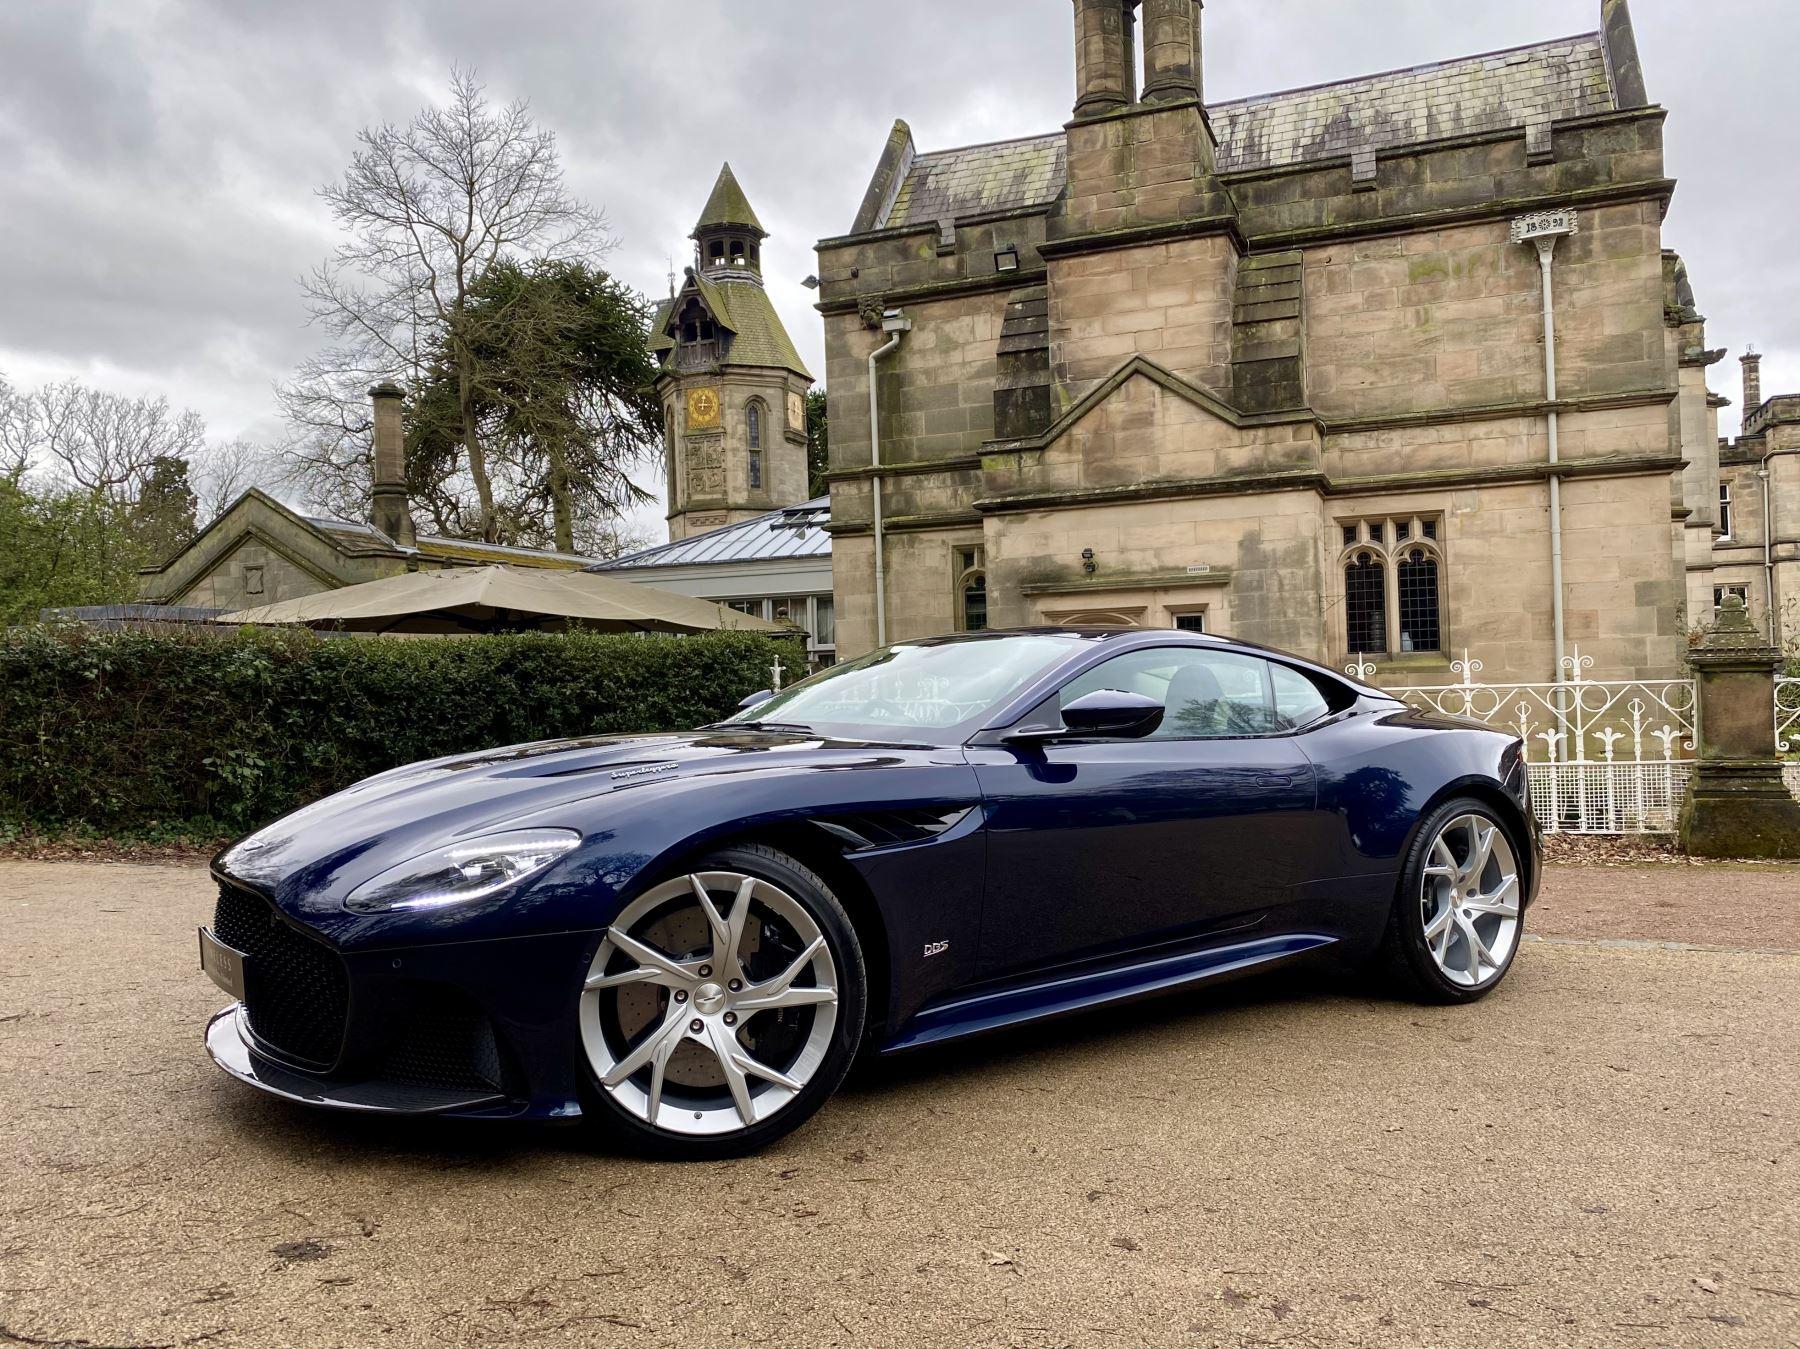 Aston Martin DBS V12 Superleggera 2dr Touchtronic 5.2 Automatic 3 door Coupe (2019) image